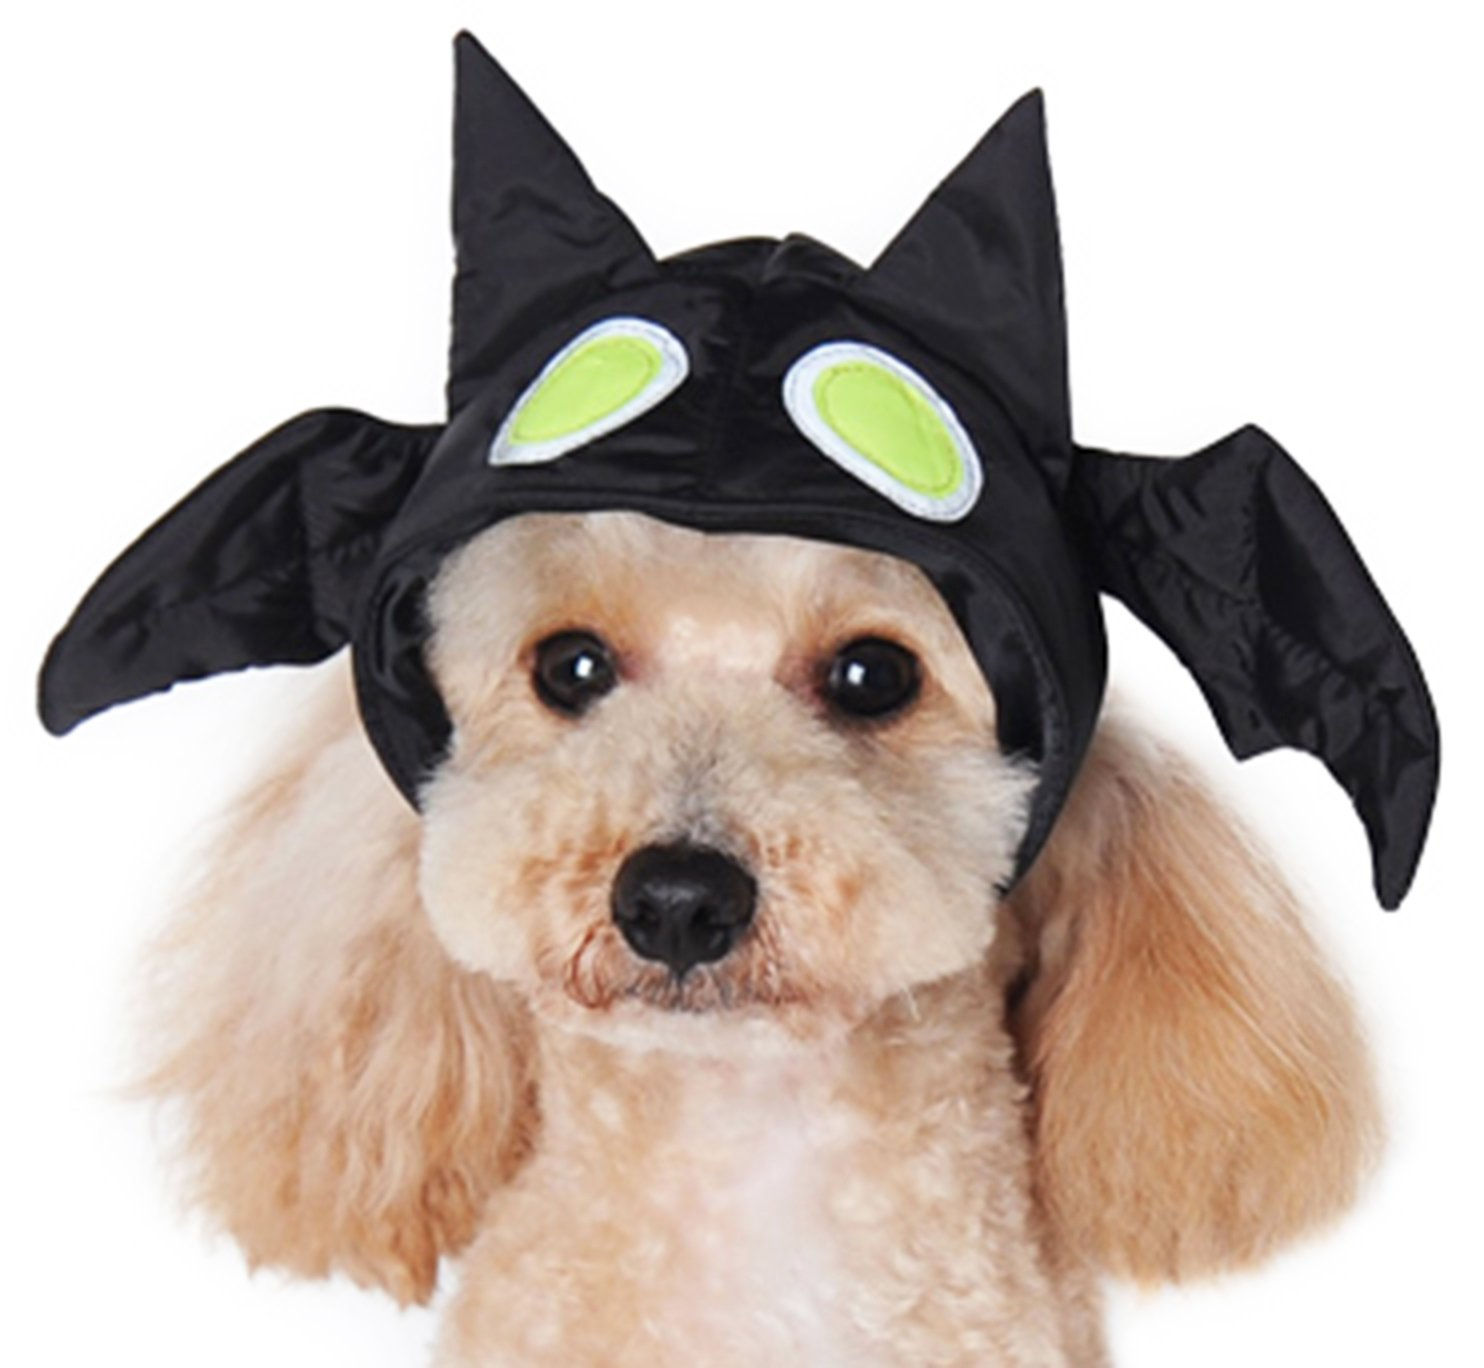 L Dogo Bat Hat w Glow in The Dark Eyes for Cat Dog Puppy Pet (L)